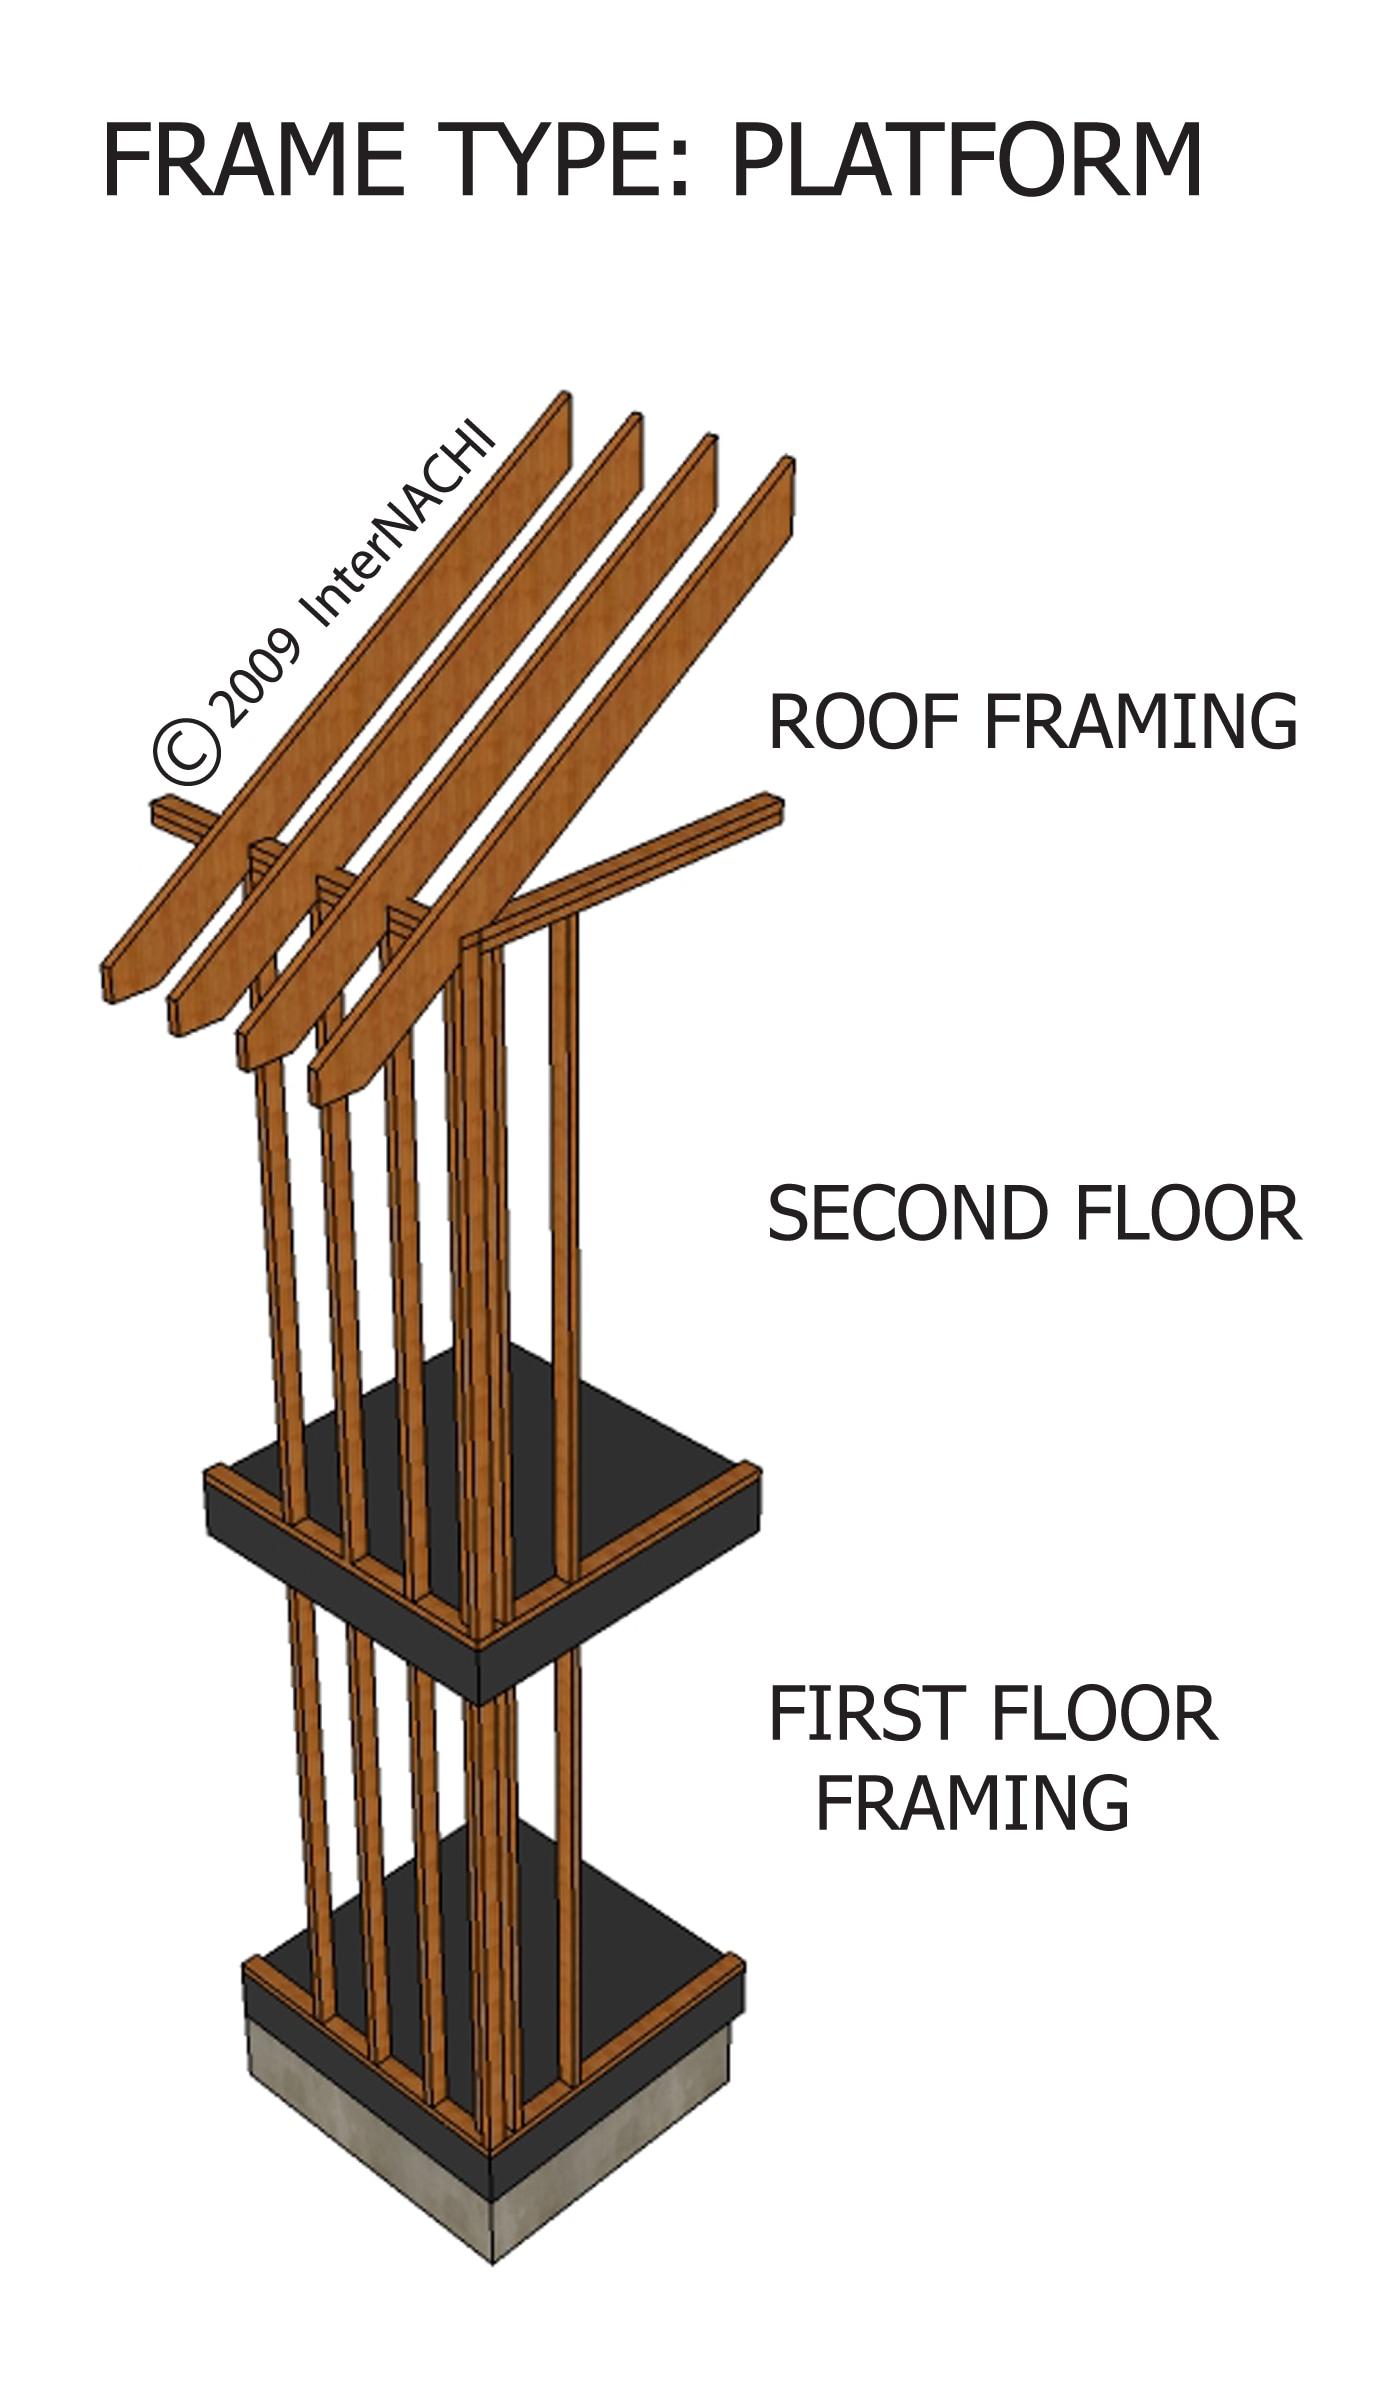 Platform framing.